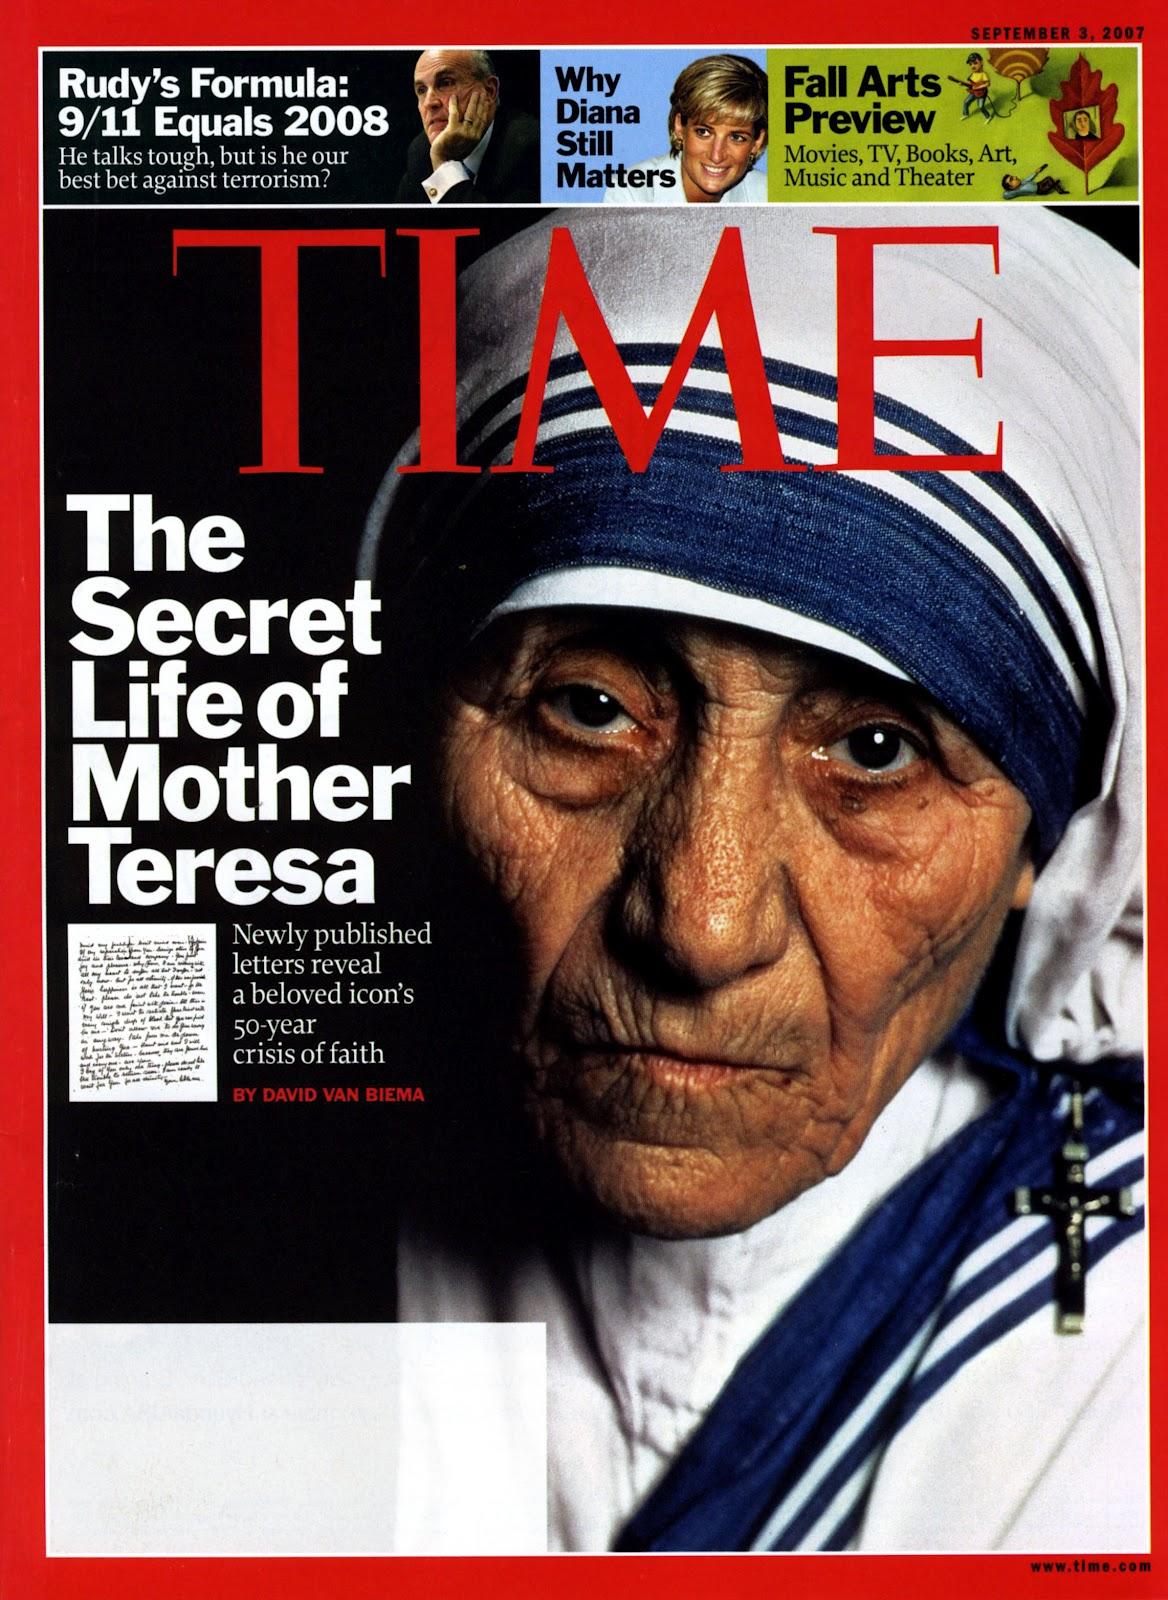 jamie lynne grumet: time magazine cover